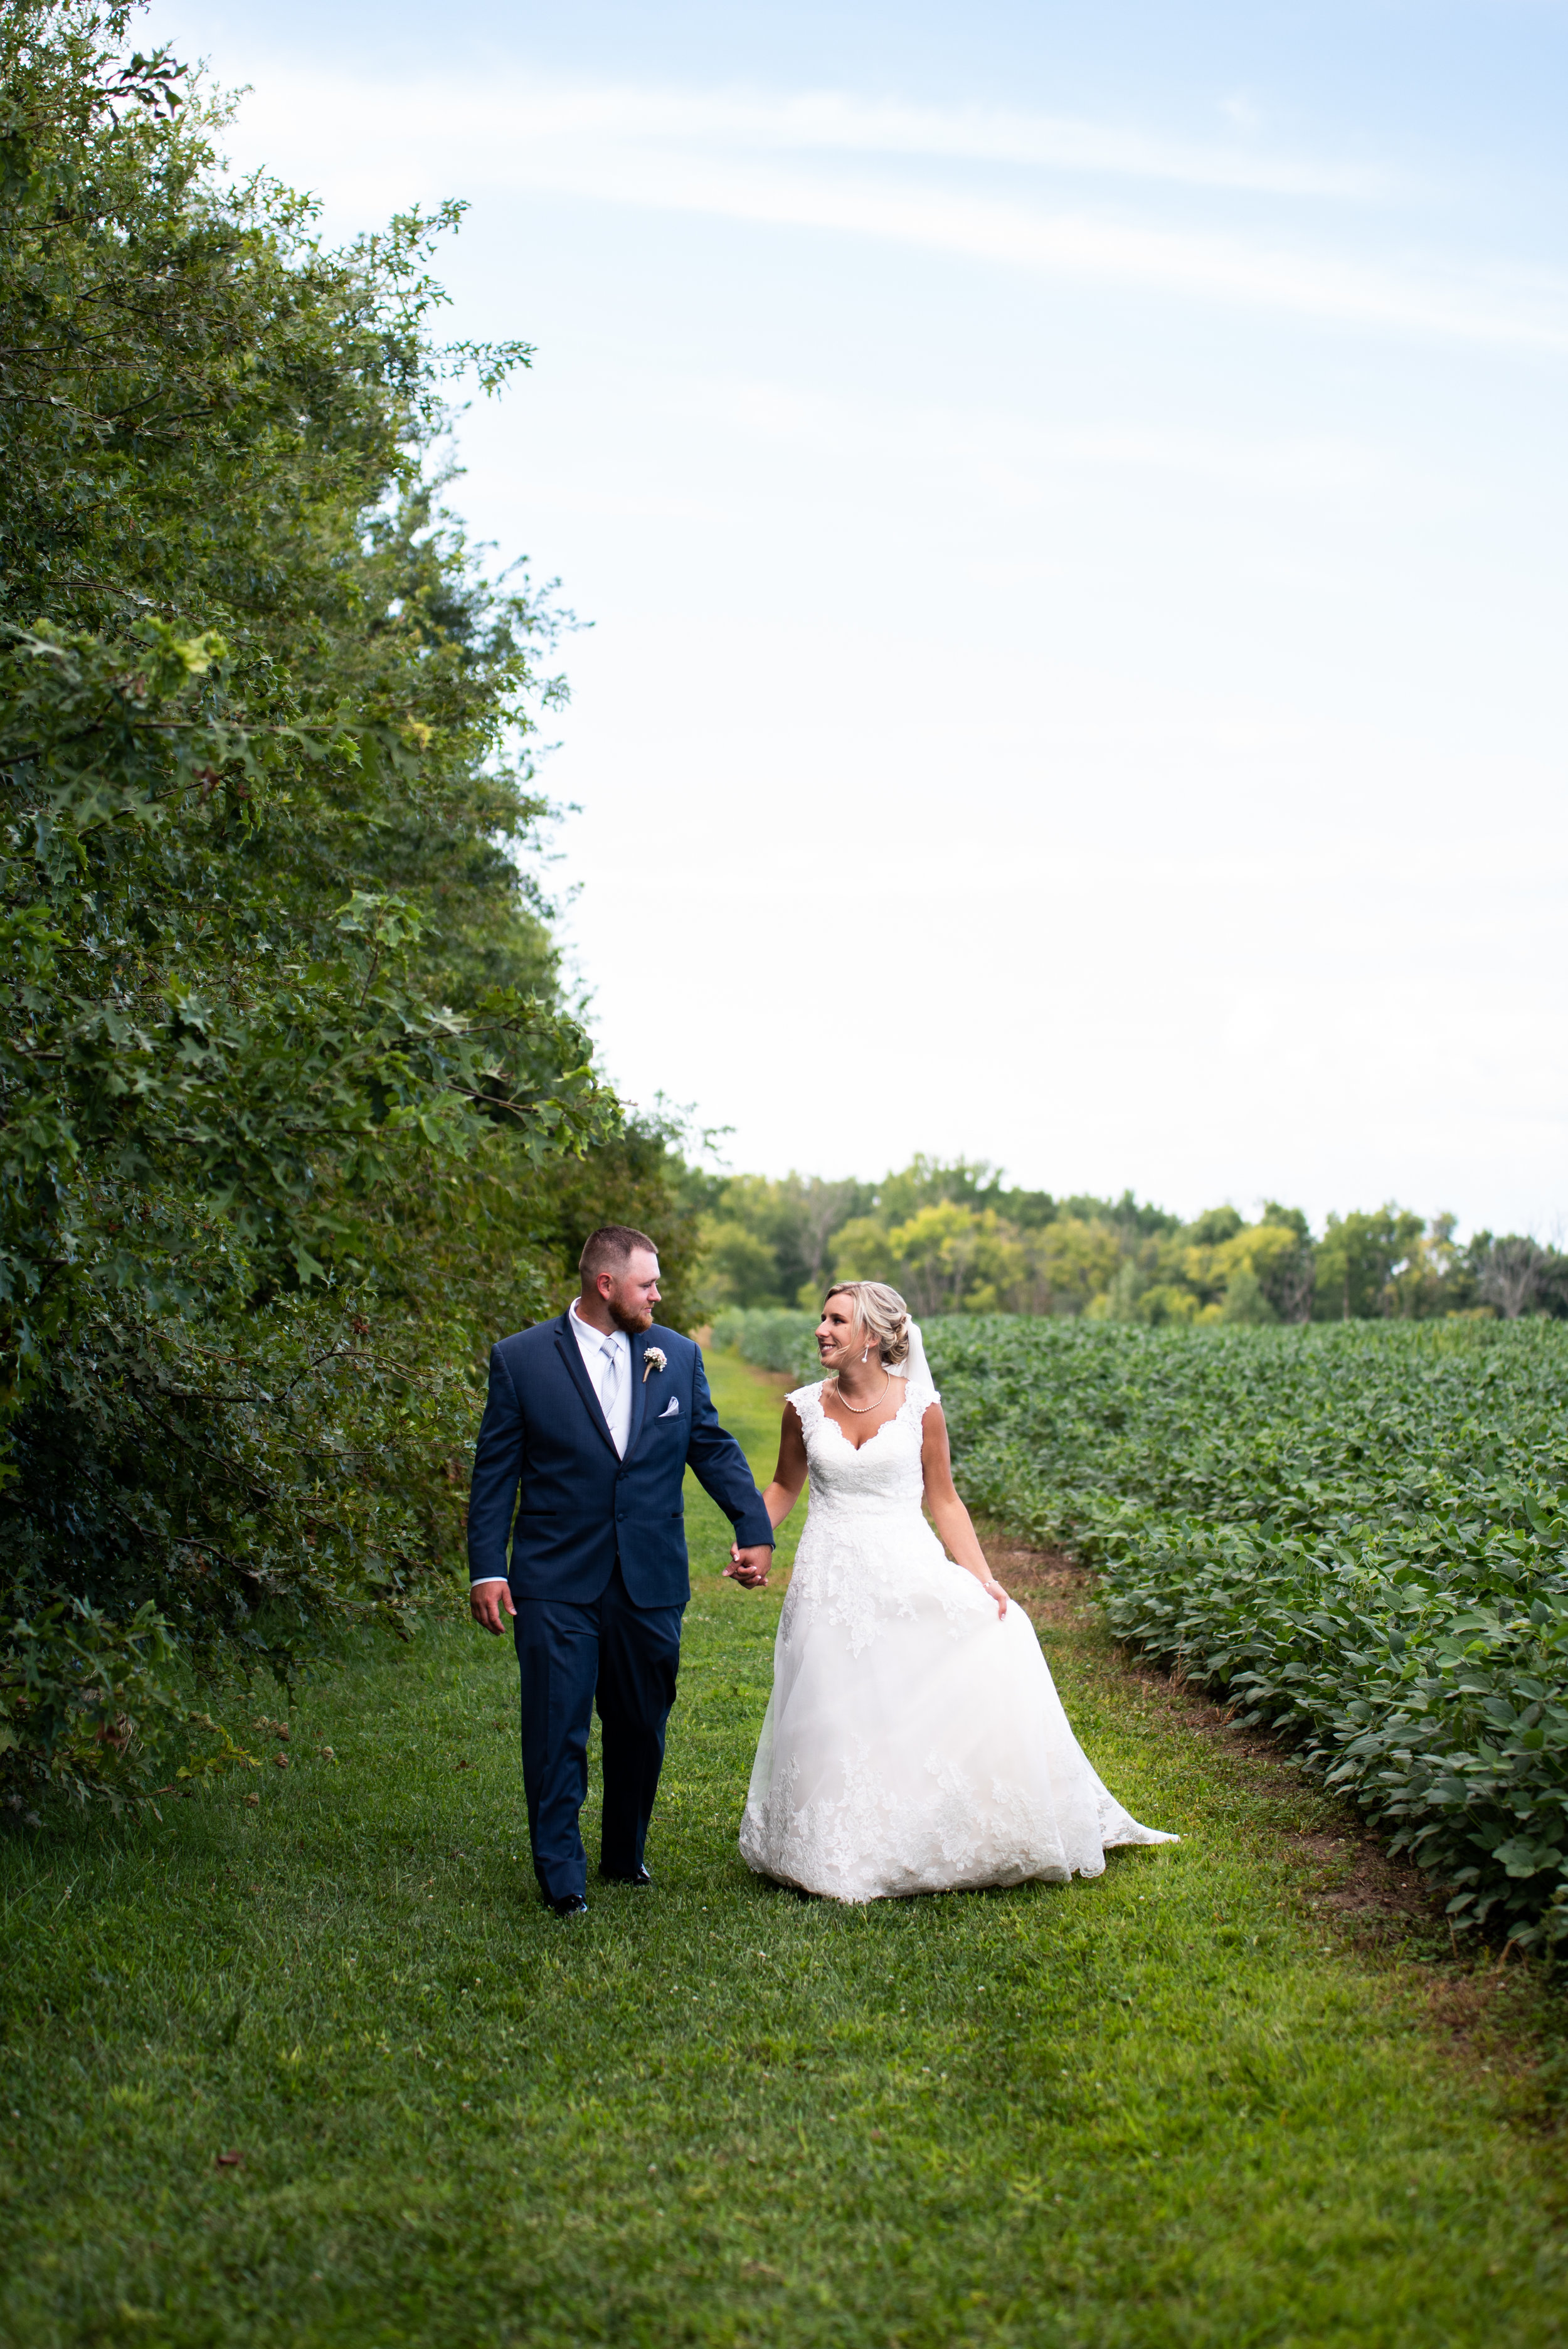 wedding (1 of 1)-185.jpg